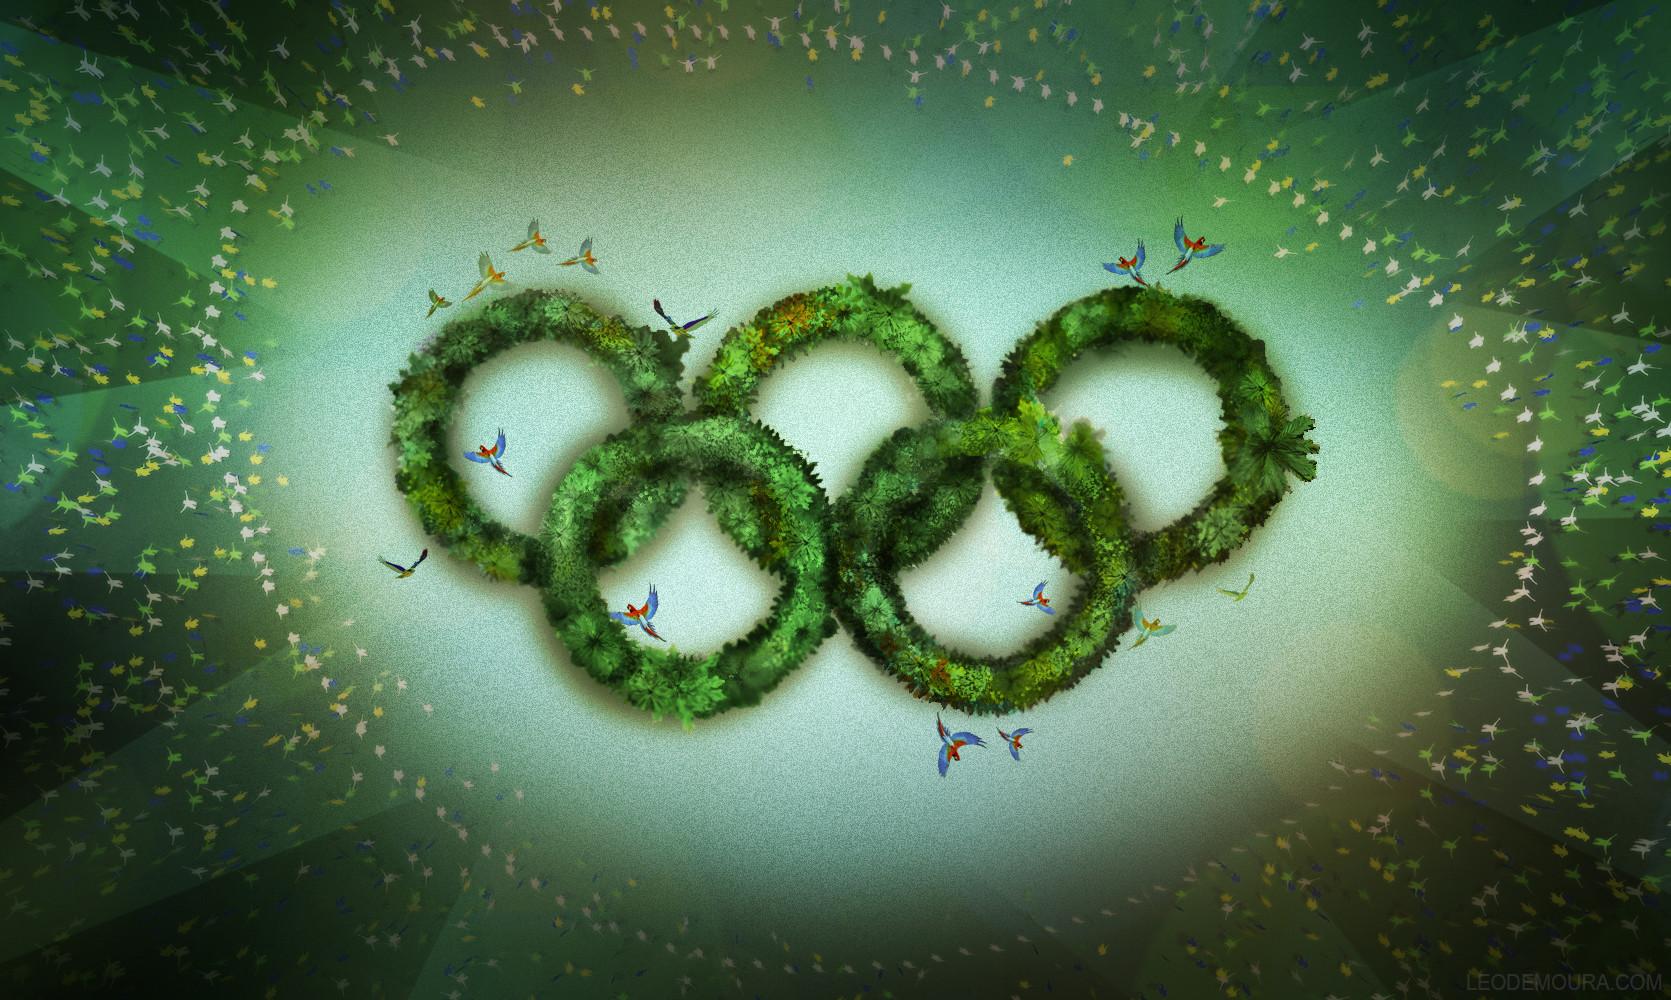 Leonardo de moura art ooc seg parade of athletes v00 lmo 20150808 olympic rings 03 2 copy